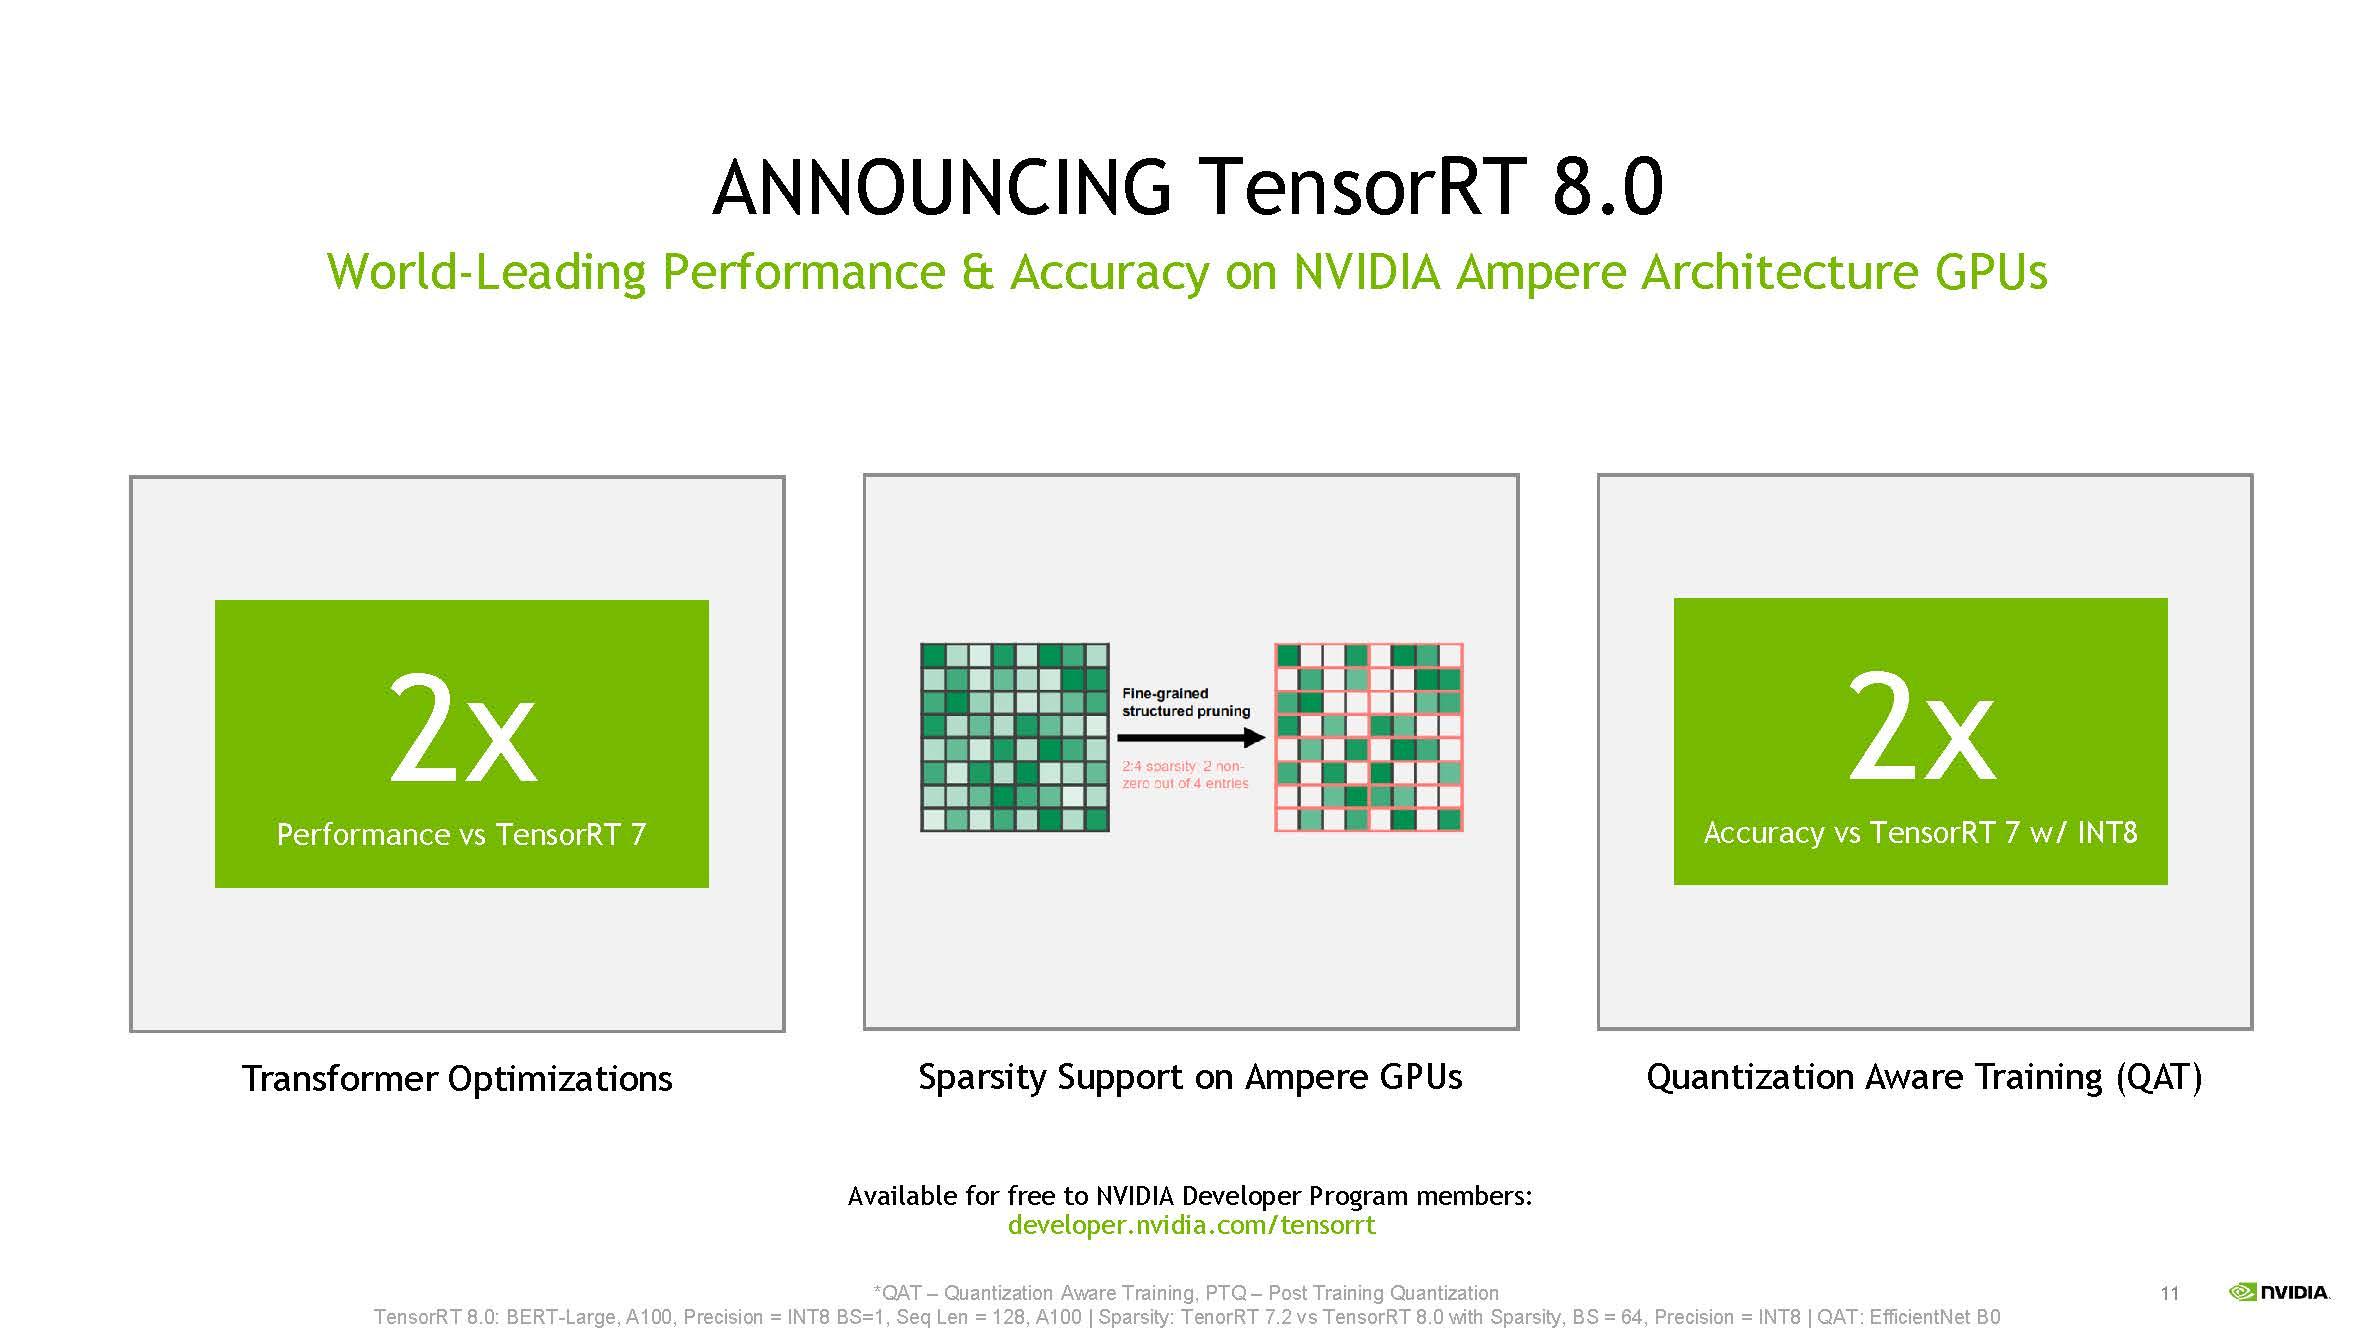 NVIDIA TensorRT 8 And RecSys TensorRT 8